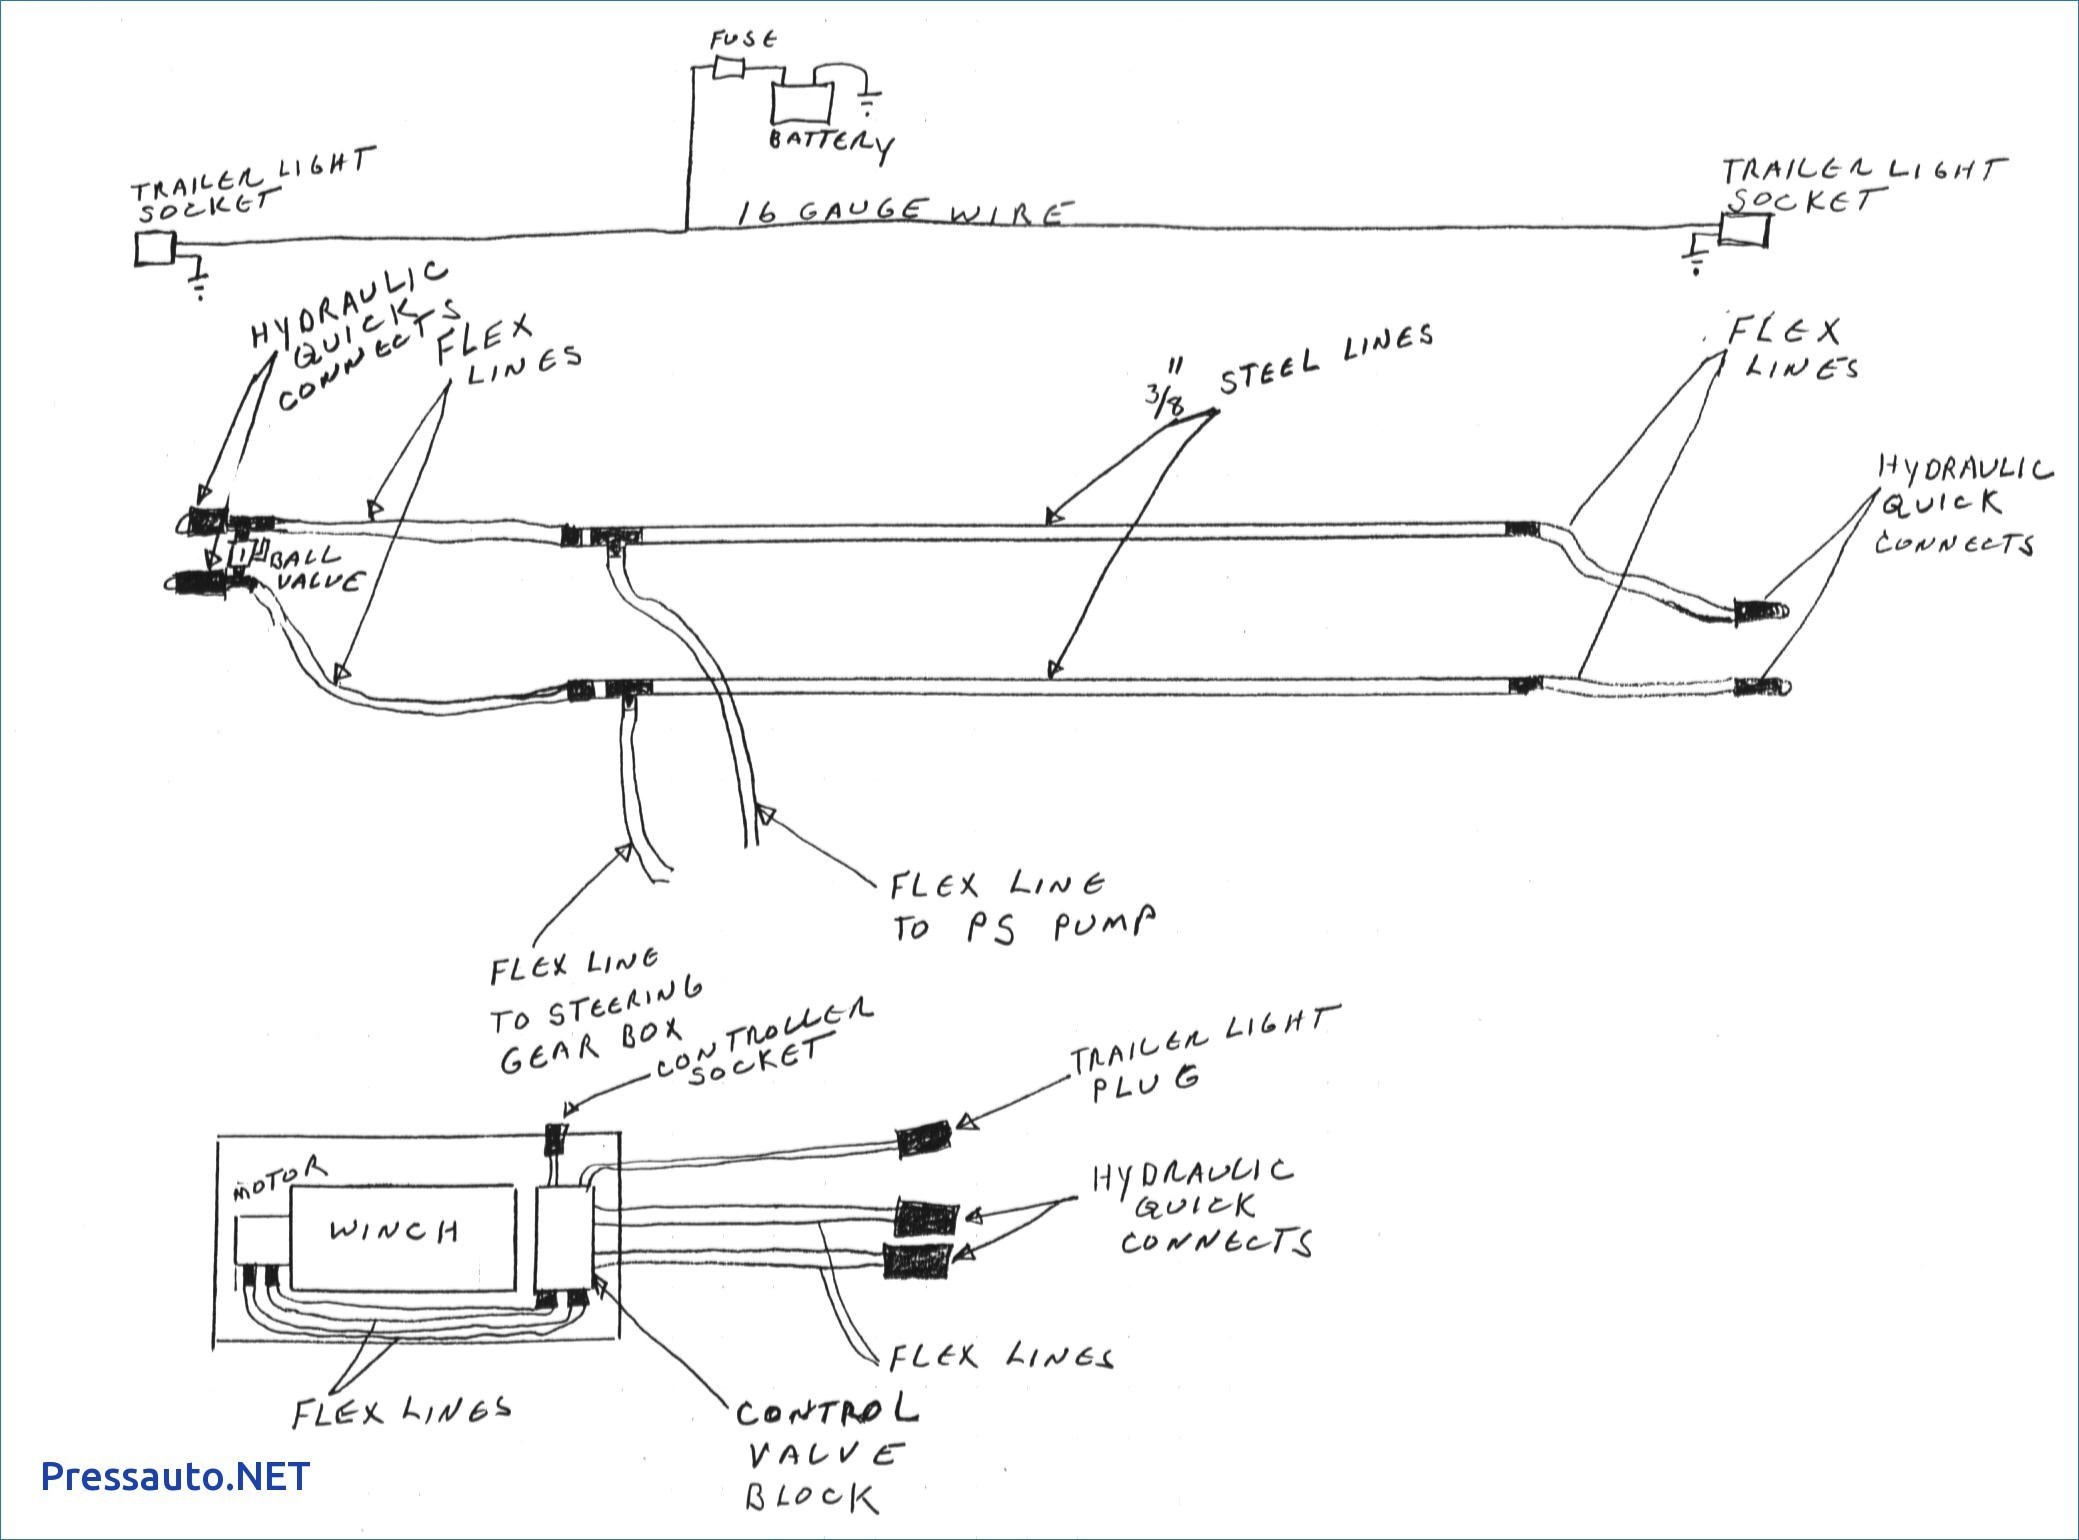 Badland Wireless Winch Remote Control Wiring Diagram ... on winch contactor wiring diagram, gorilla winch wiring diagram, atv winch wiring diagram, polaris ranger winch wiring diagram, winch switch wiring diagram, smittybilt winch wiring diagram, winch solenoid diagram, champion winch wiring diagram, wireless winches, realistic fm wireless microphone system connection diagram, warn winch diagram, 12 volt electric winch wiring diagram, wireless winch thumb switch ad, ramsey winch wiring diagram, trakker winch wiring diagram,